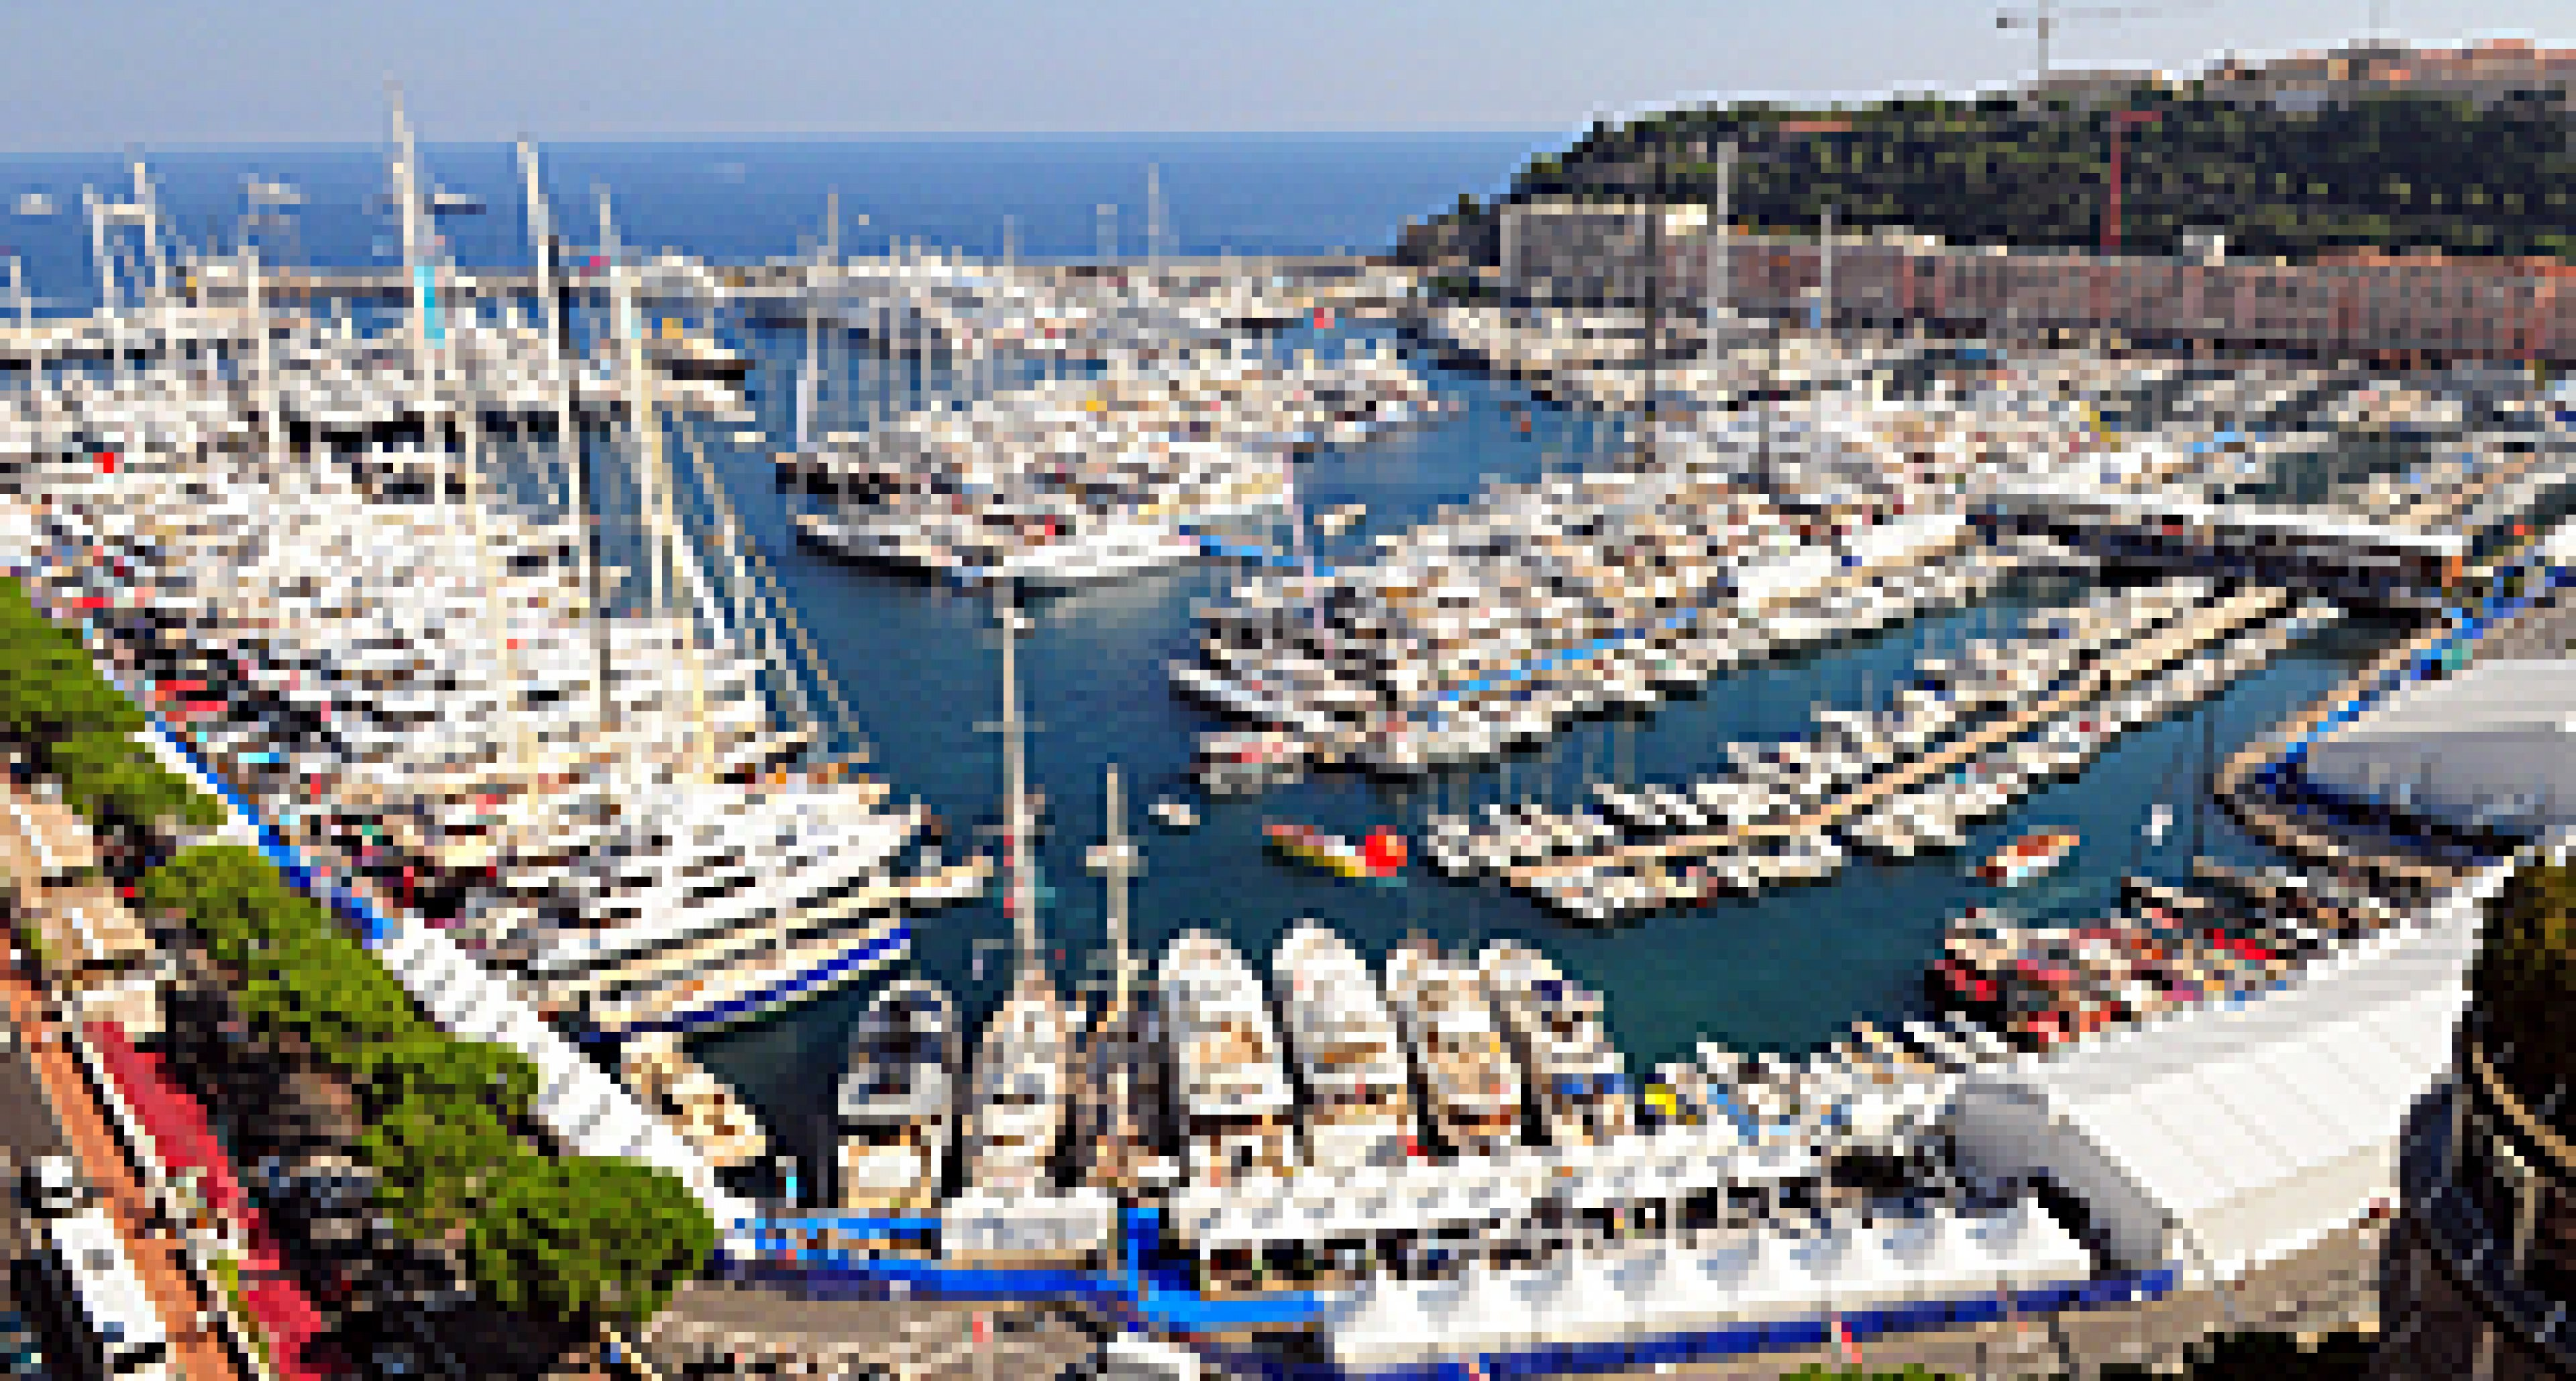 Monaco Yacht Show 2010: Top Five